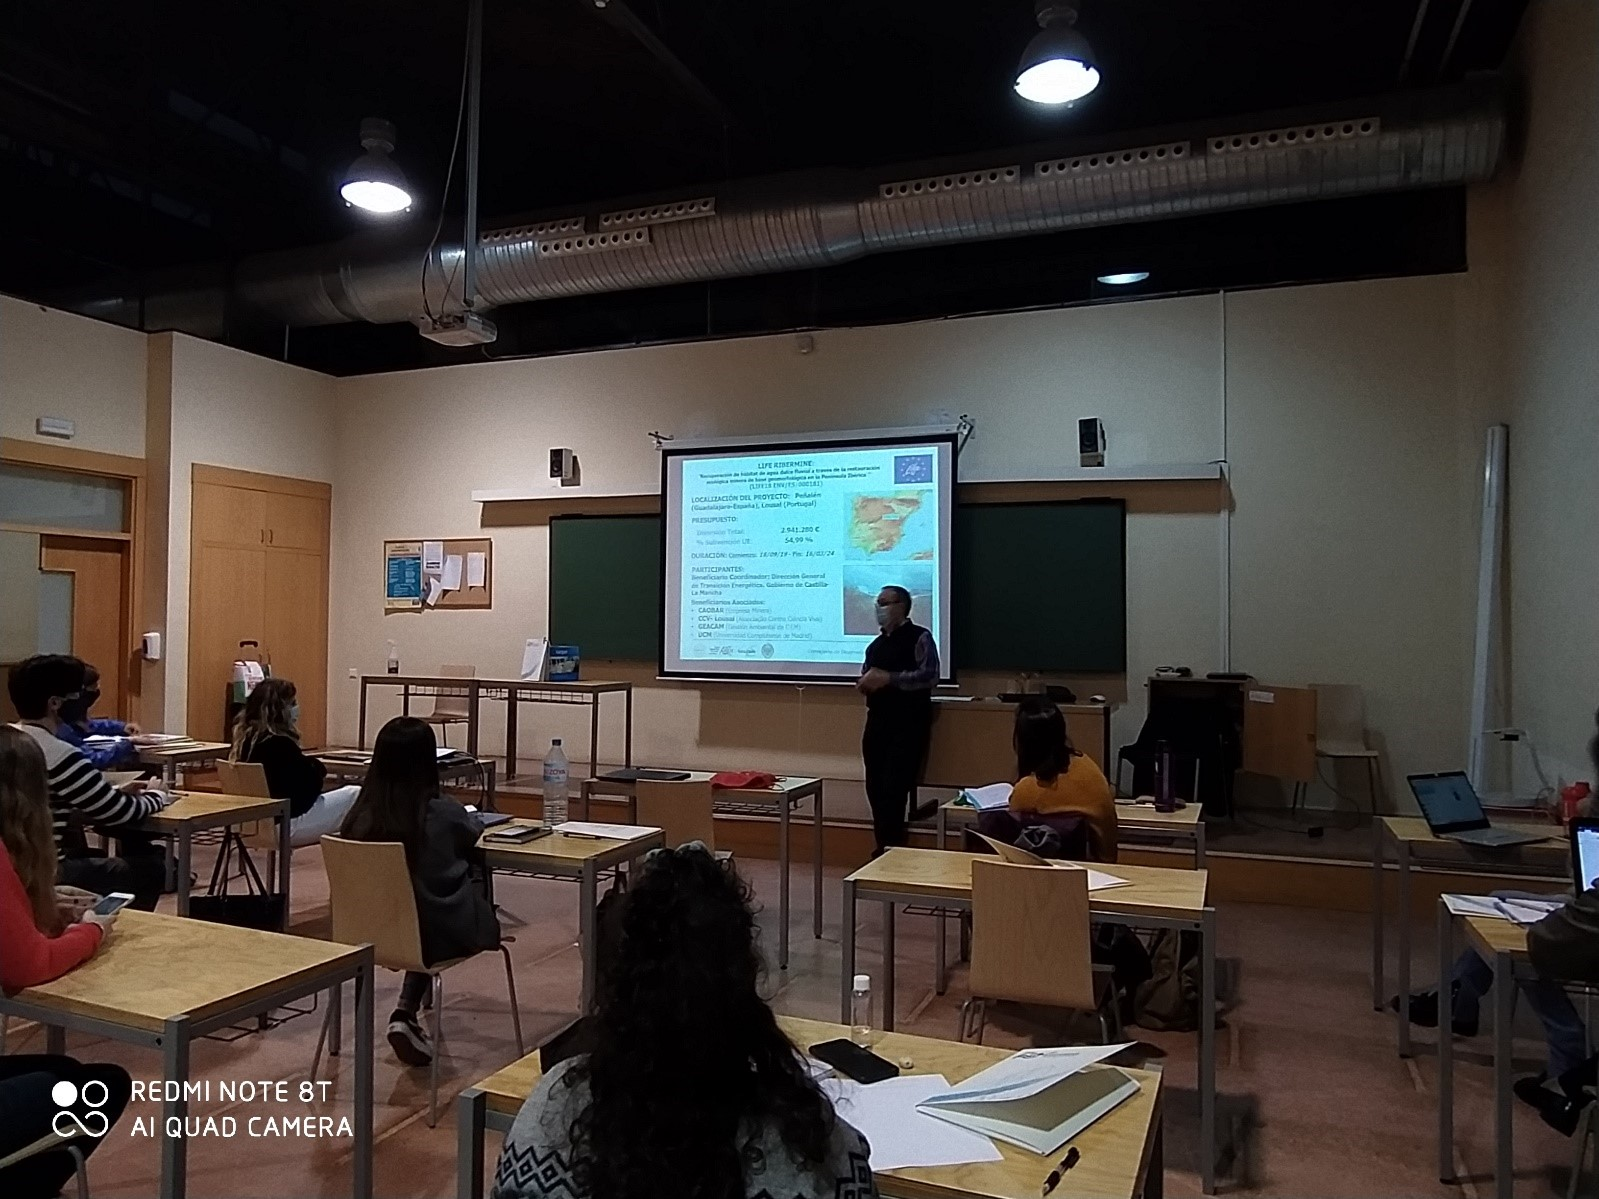 LIFE RIBERMINE integrates Curriculum of Master at the University of Castilla-La Mancha